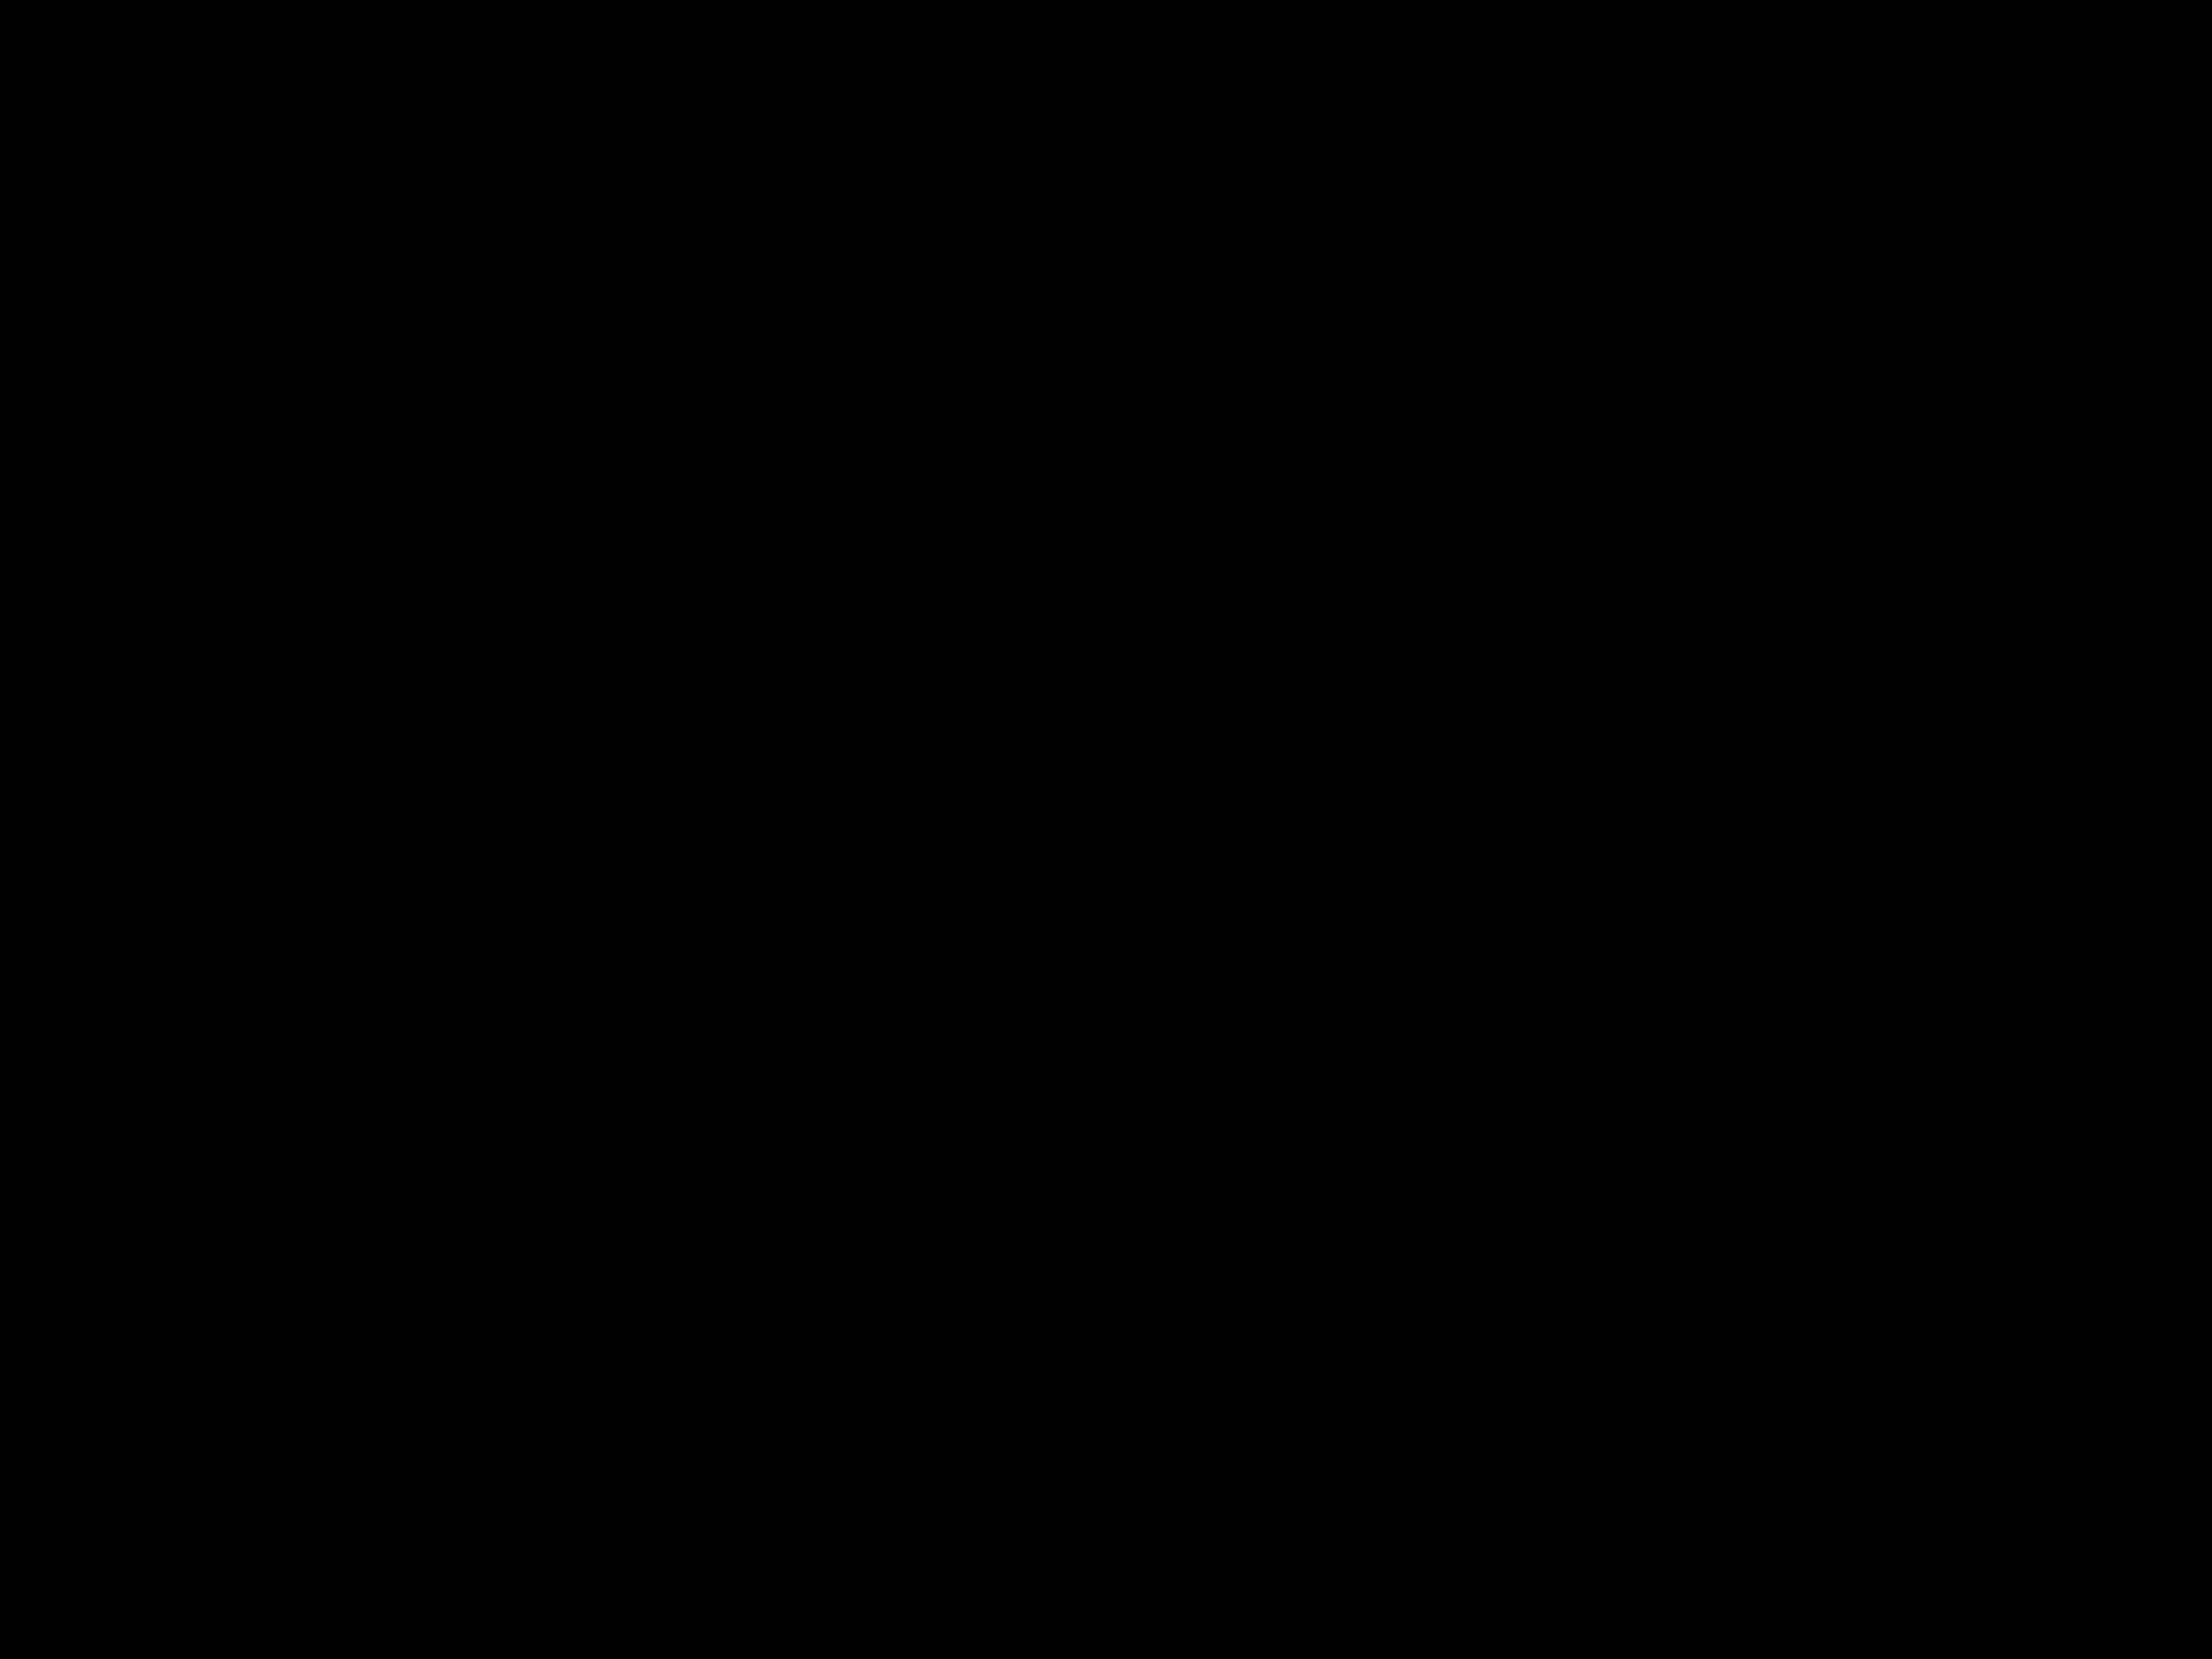 Douglas fijnbezaagde plank | 1,5 x 14 x 180